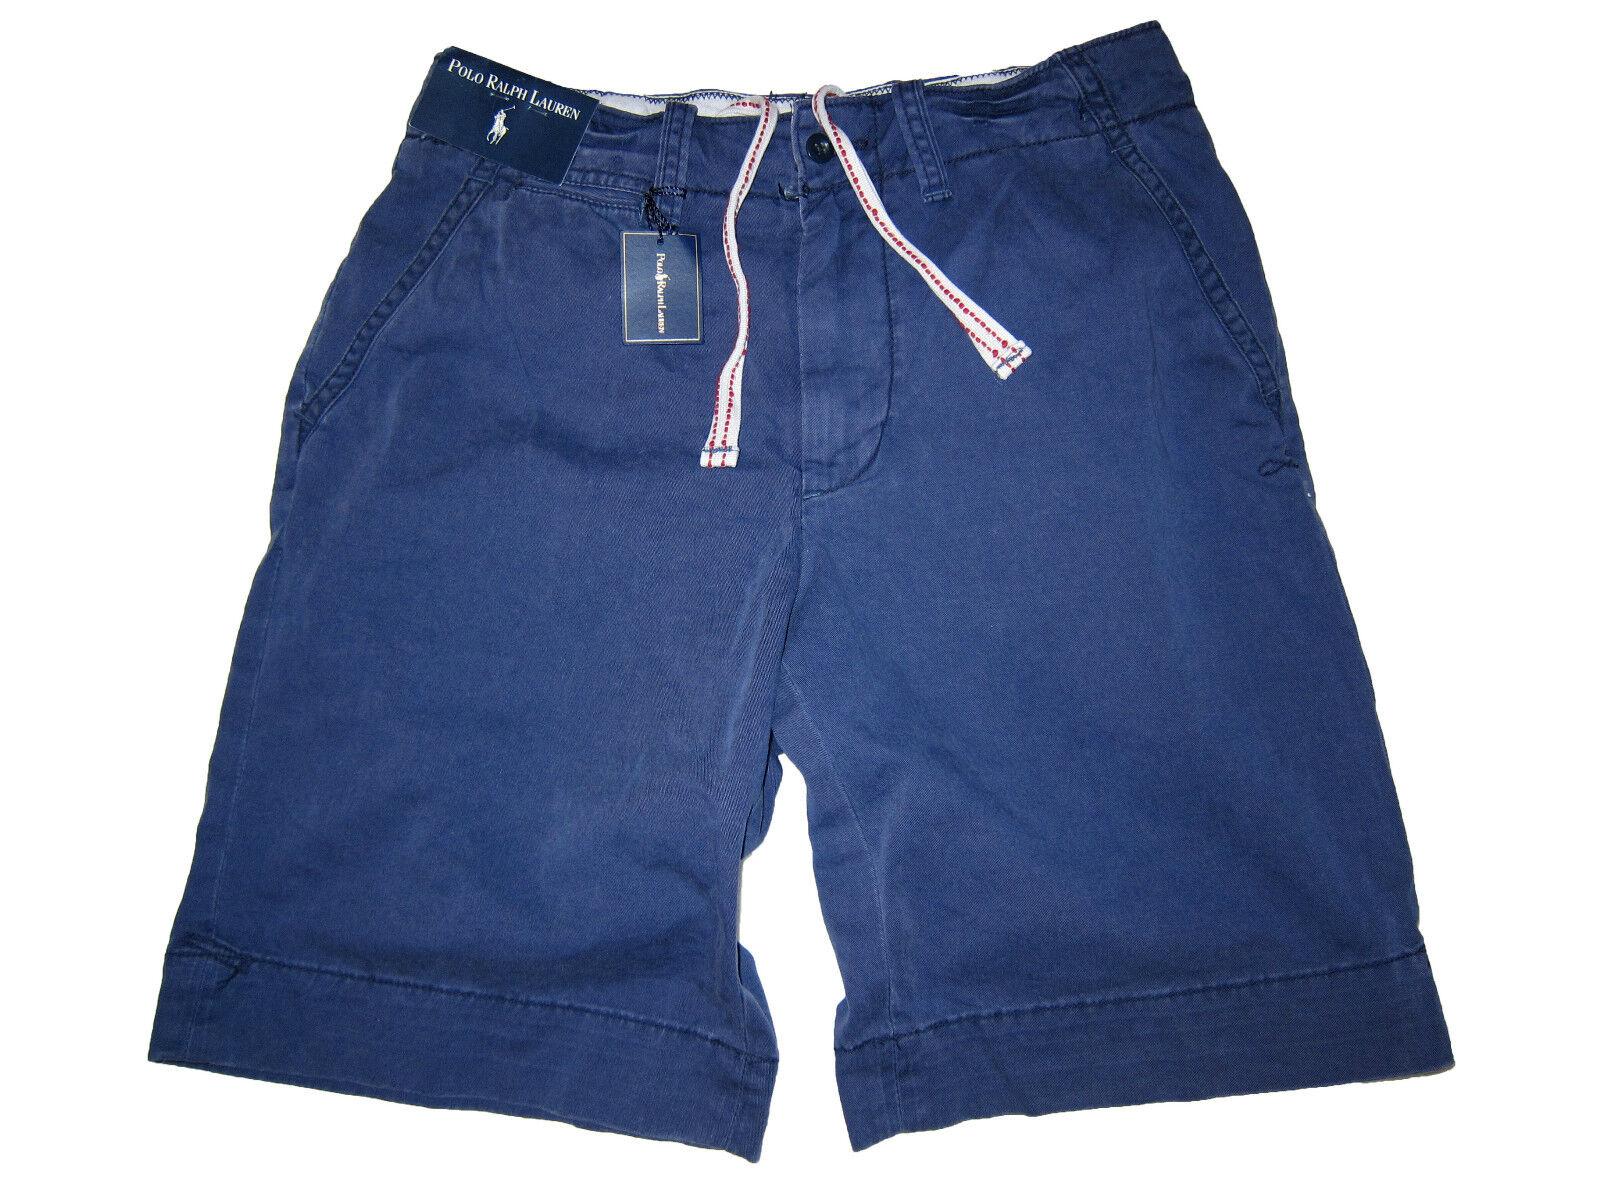 Polo Ralph Lauren Navy bluee Big Pony Flat Front Shorts 33